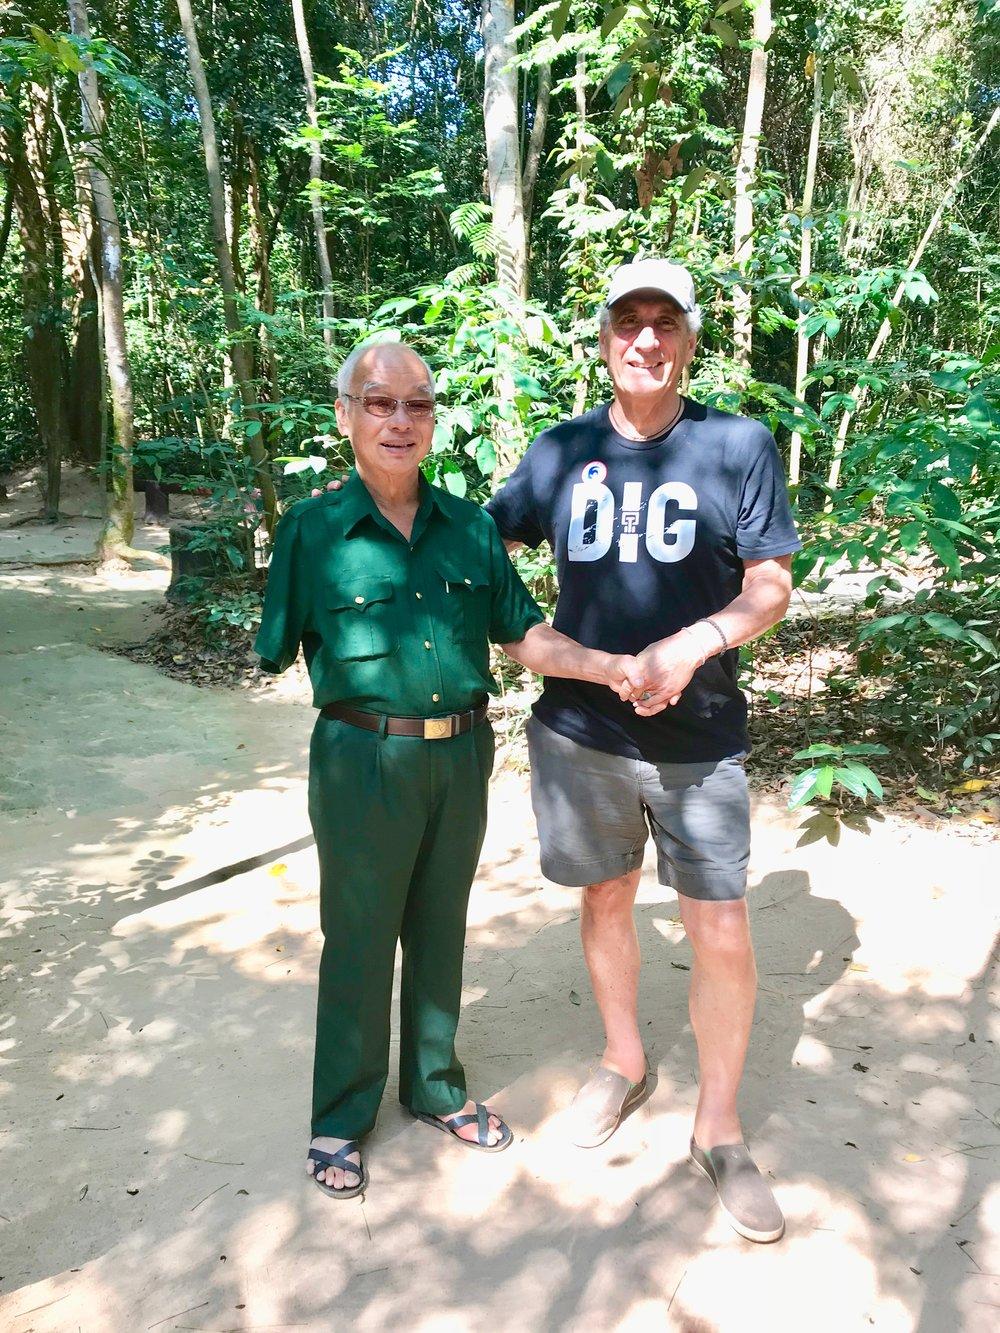 Photo w Viet Cong Vet shaking hands.jpg